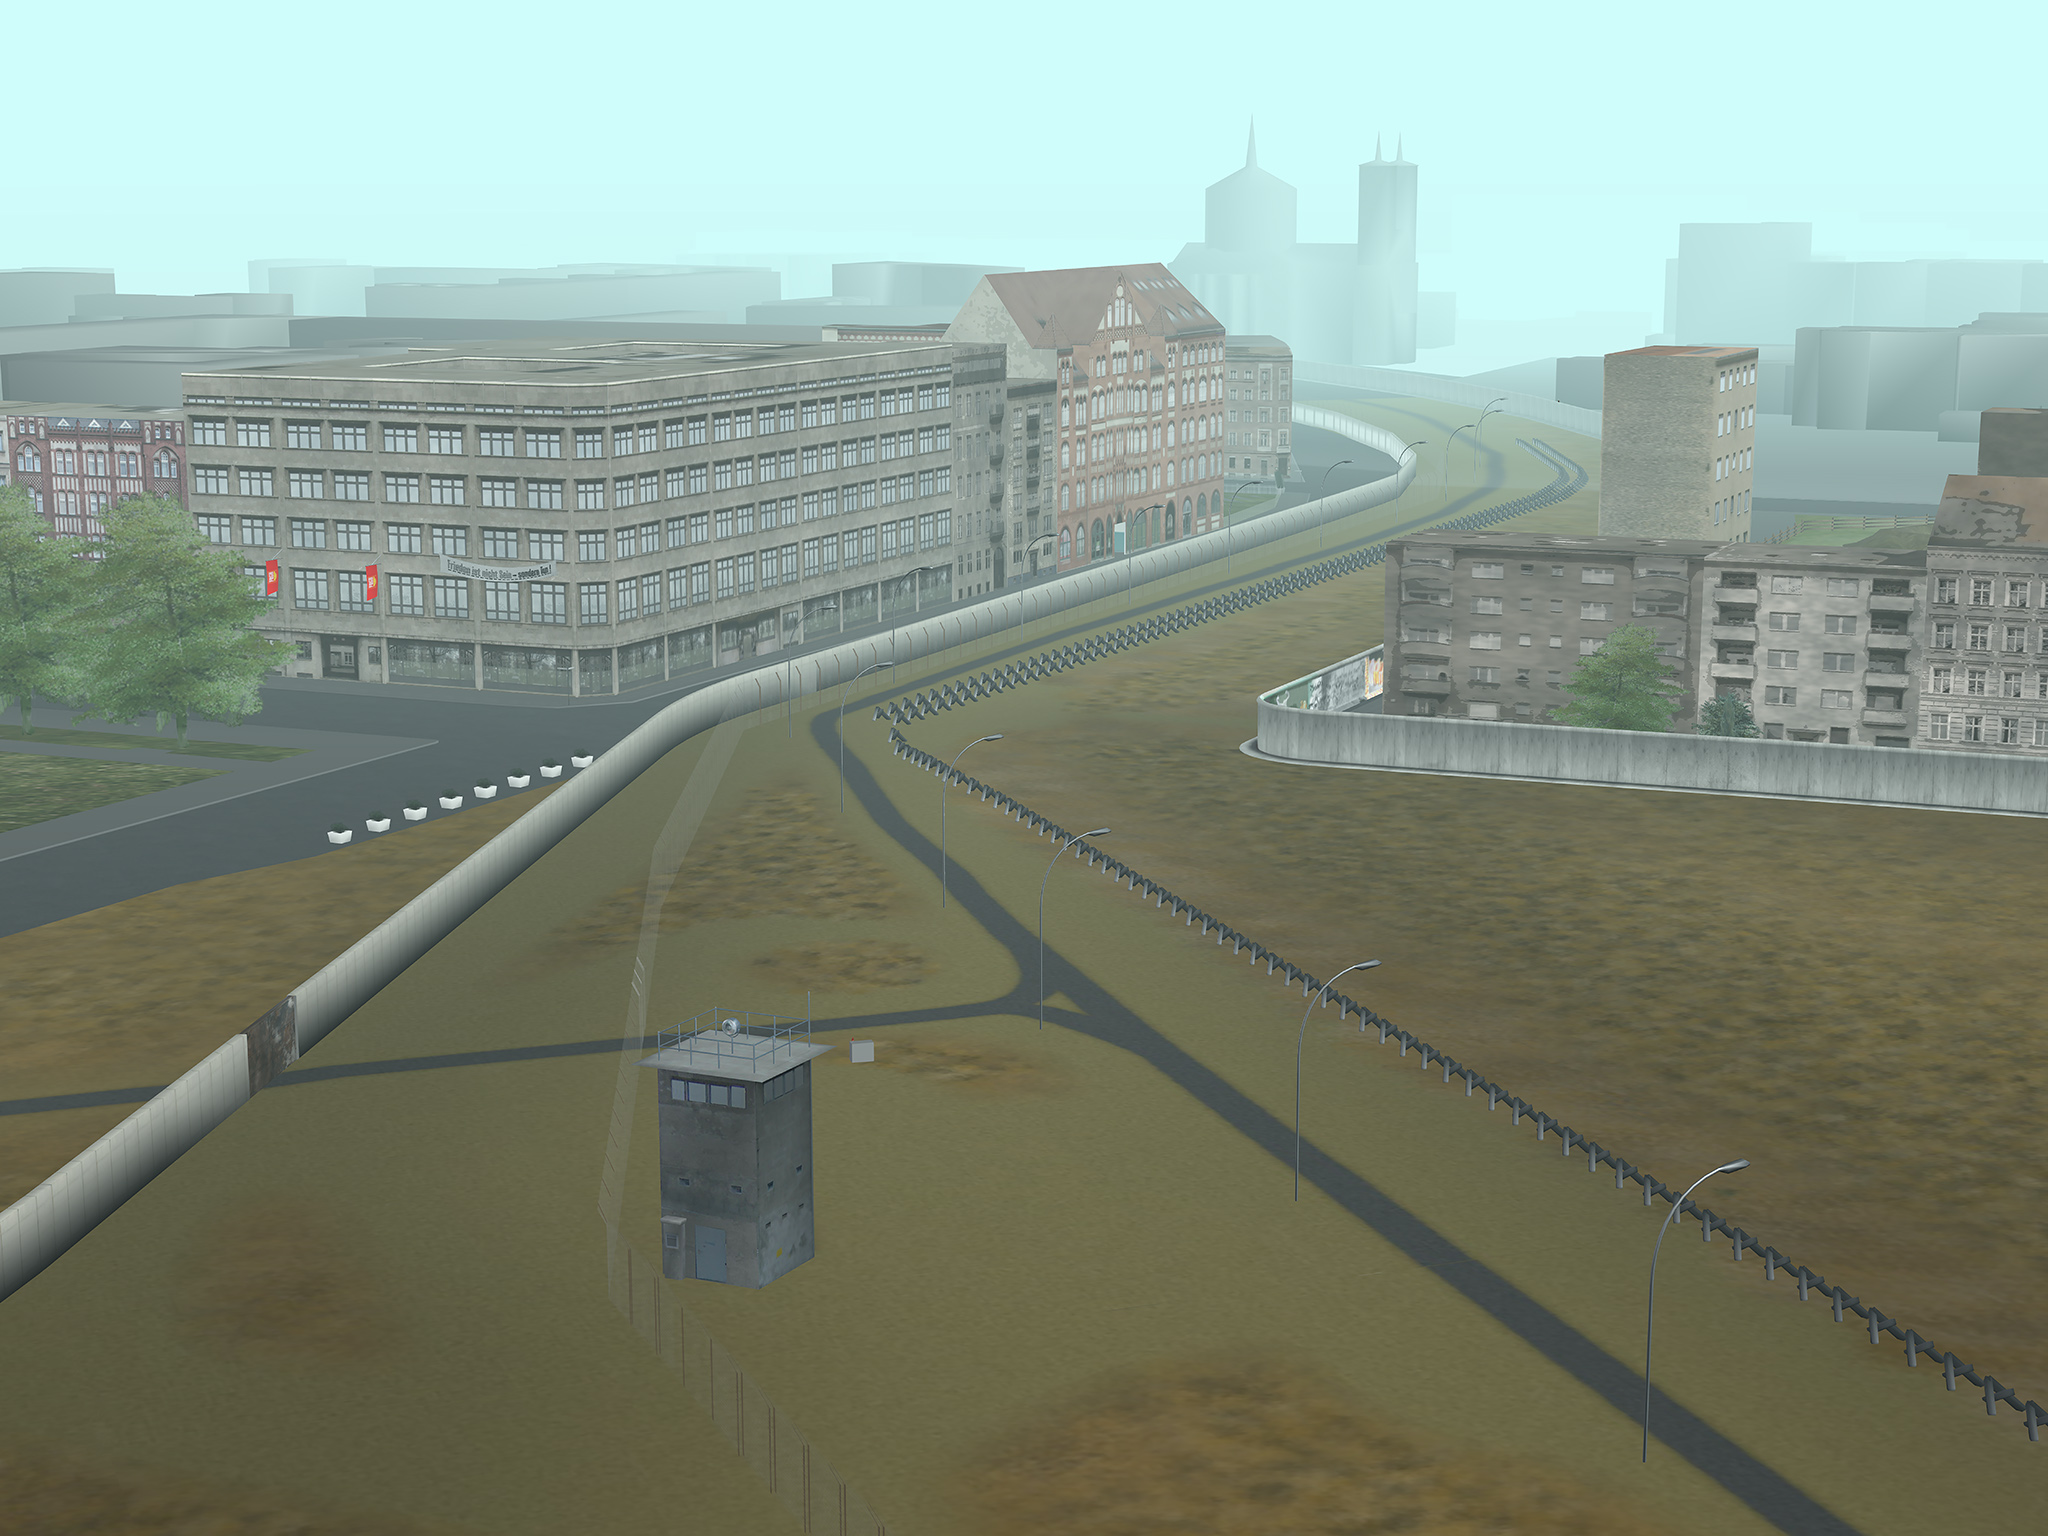 Tamiko Thiel, Virtual Berlin Wall: Bird's eye view of the Engelbecken Death Strip looking N.E., 60 x 80 cm on Hahnemühle paper, ed. 5 + 2 a/p, 2008/2021